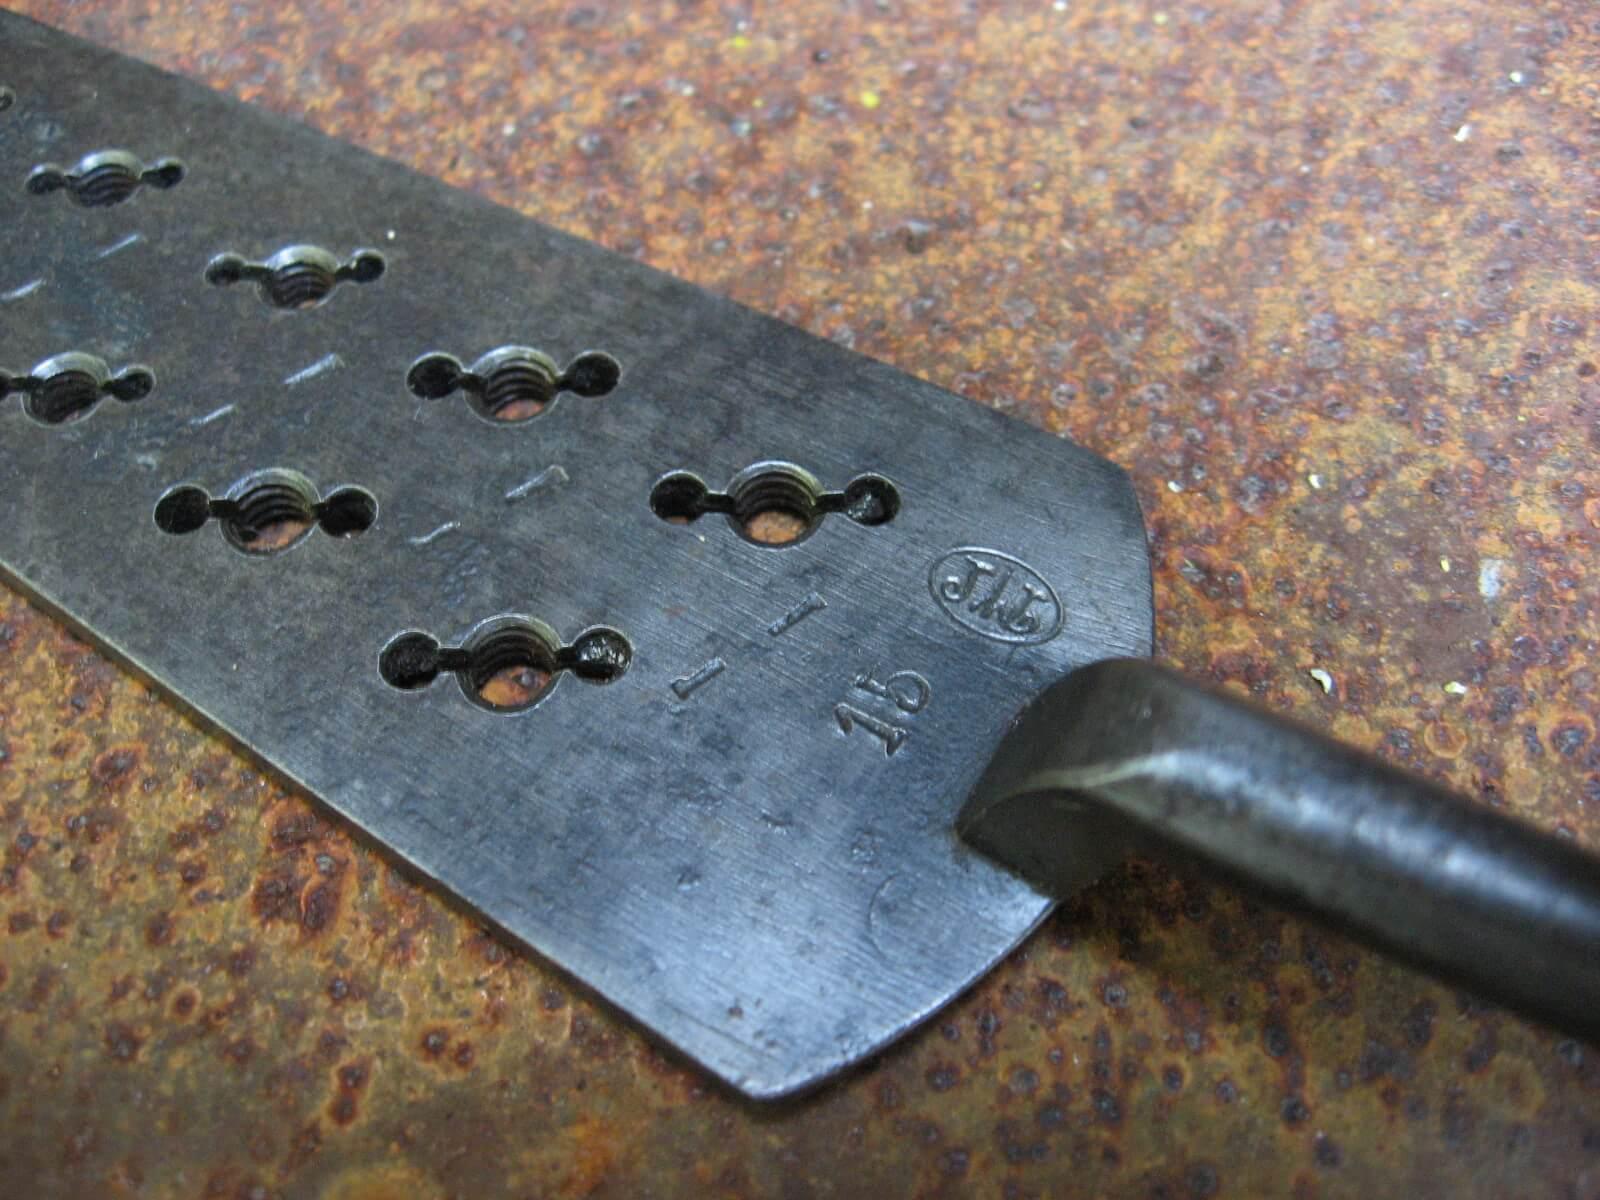 watch wire winder gauge vintage tool at PumpjackPiddlewick